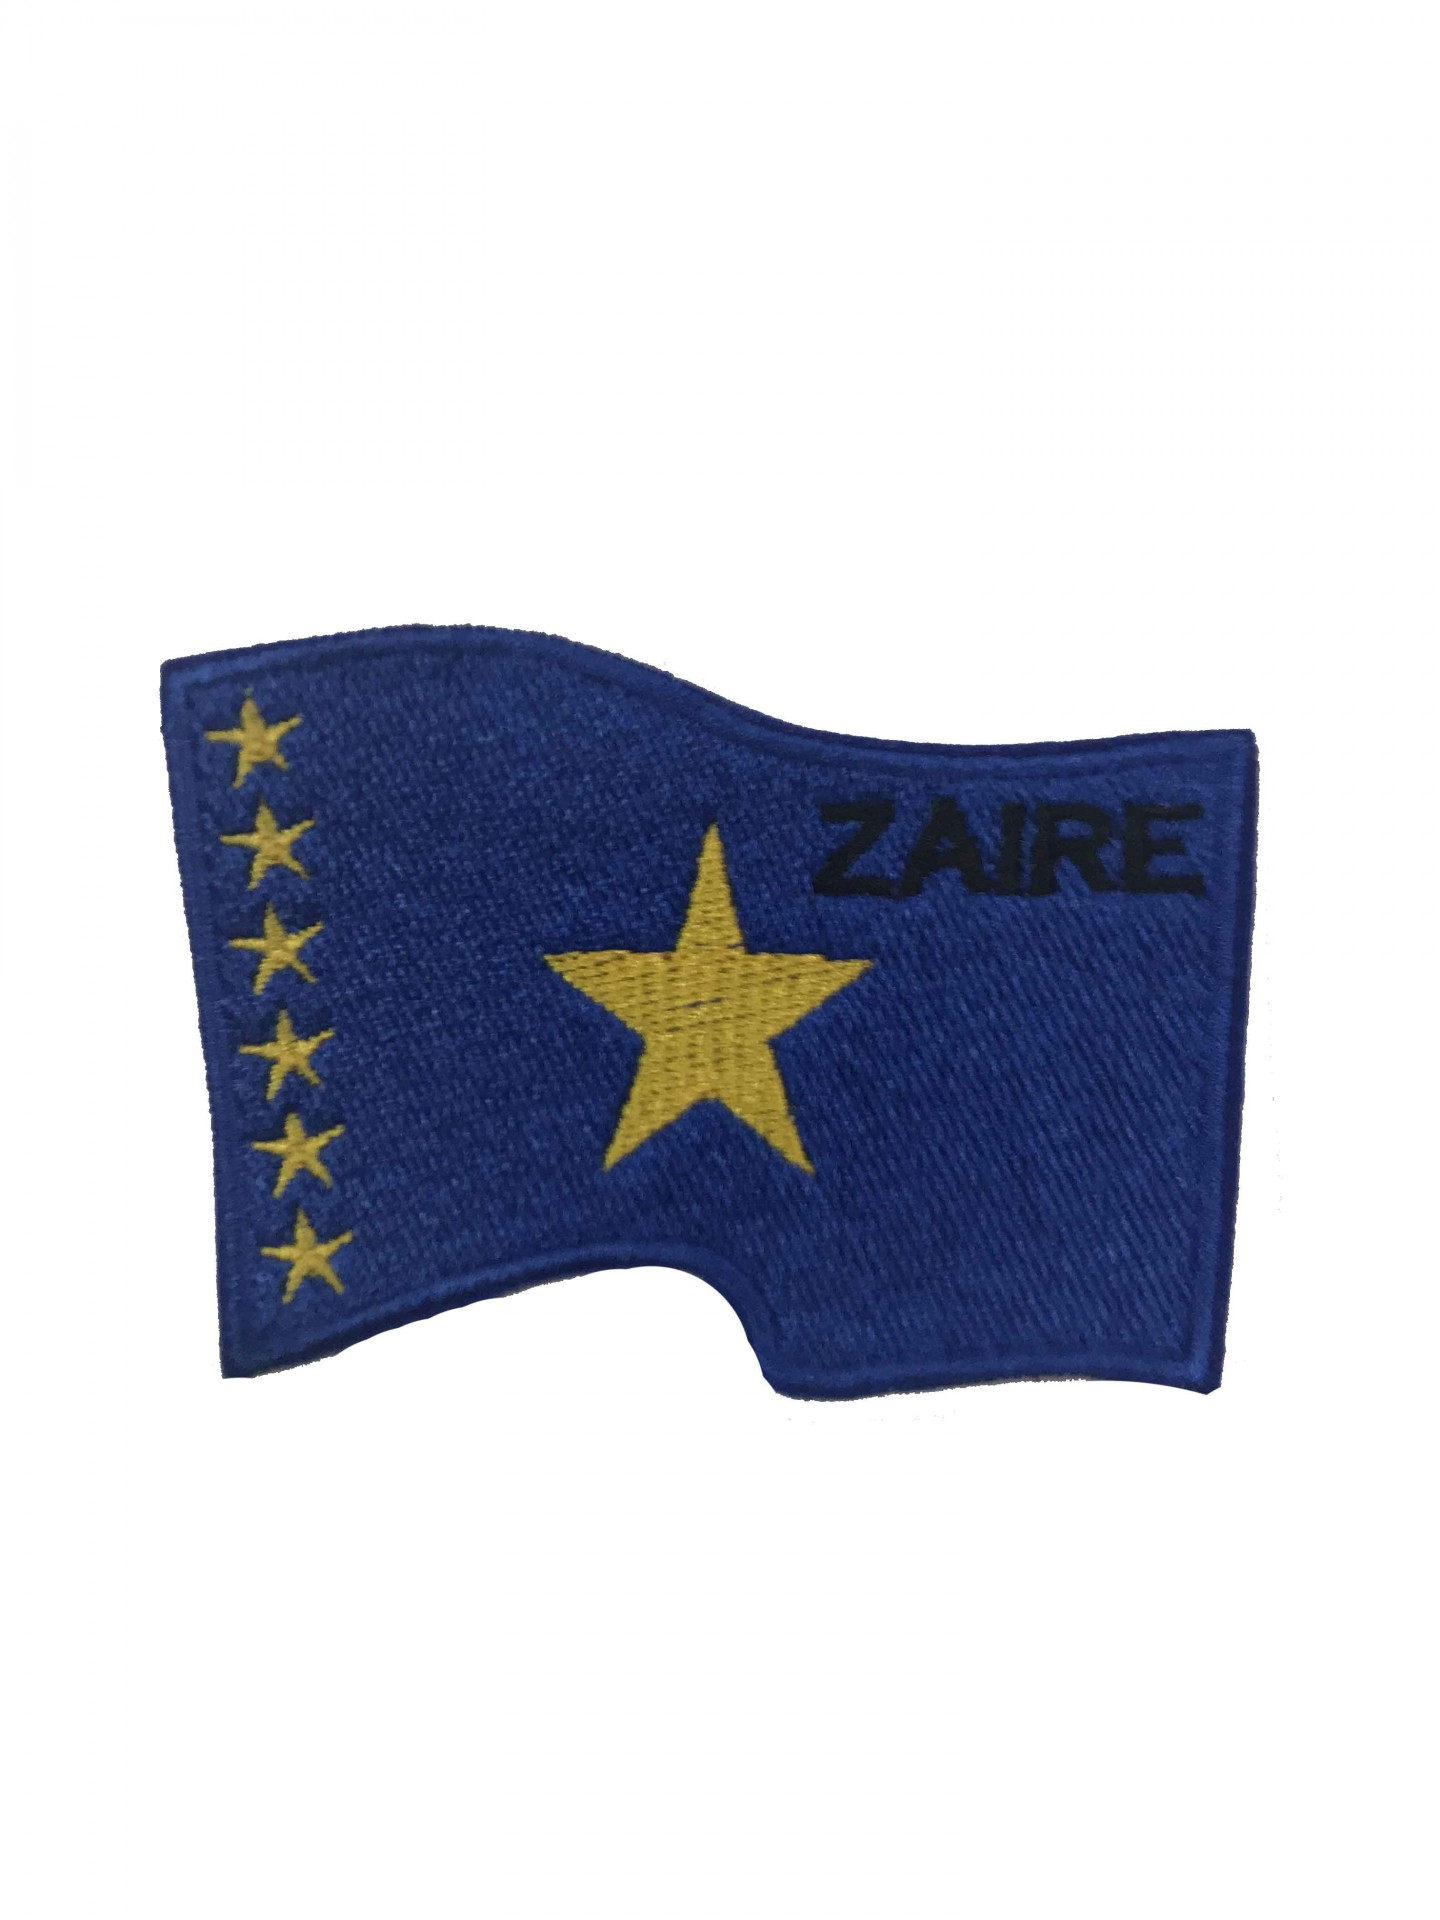 Emblema Zaire